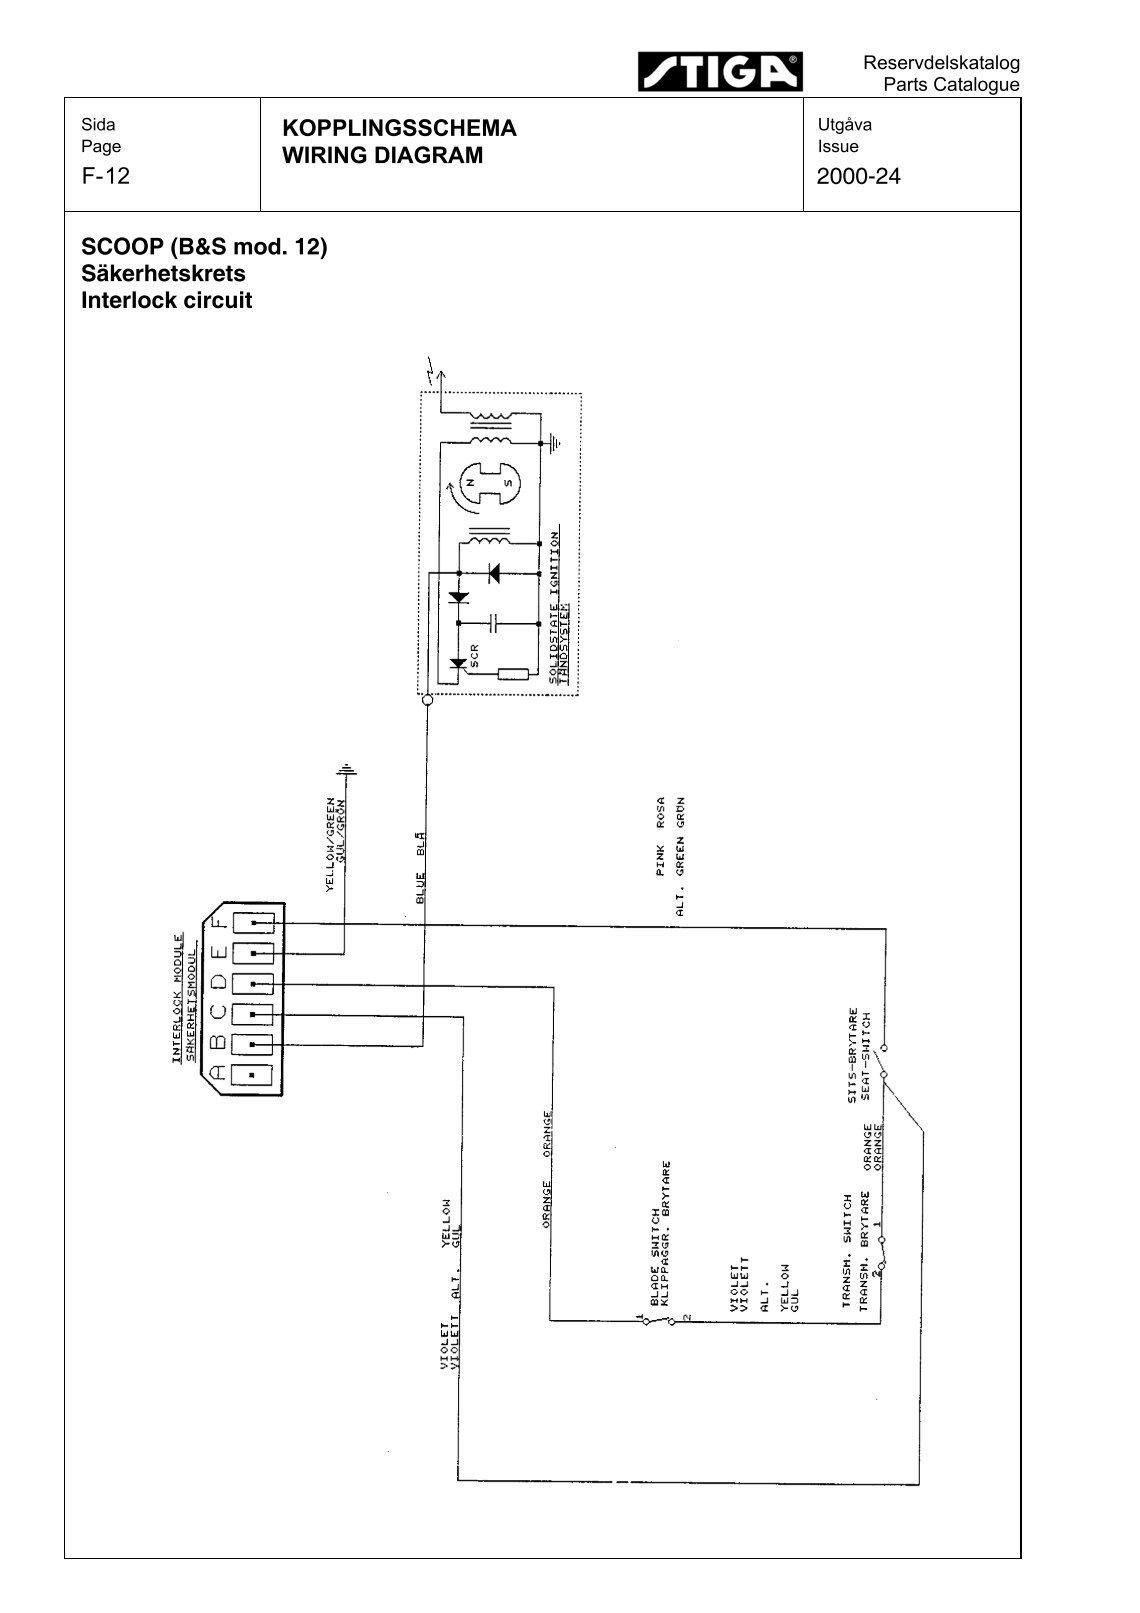 small resolution of m1008 wiring diagram wiring schematics diagram rh wiring regdiy co cucv m1009 wiring diagram m1008 wiring diagram